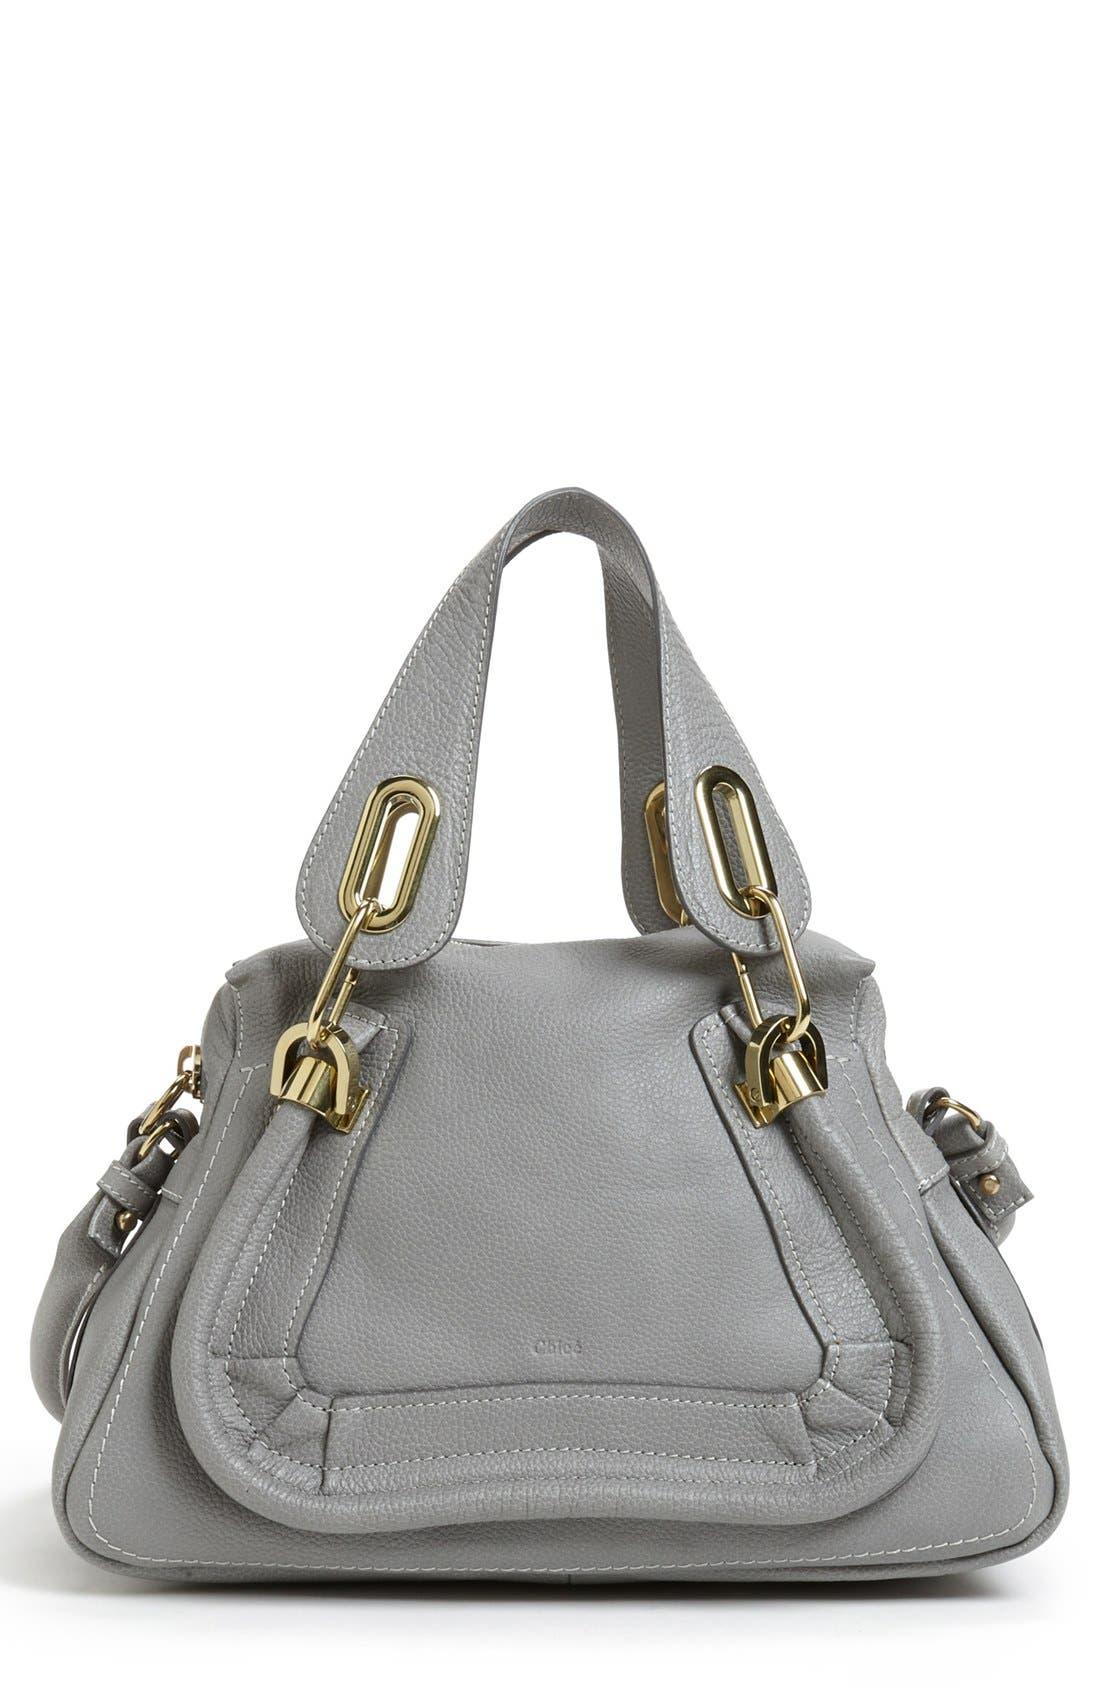 CHLOÉ 'Paraty - Small' Leather Satchel, Main, color, 020